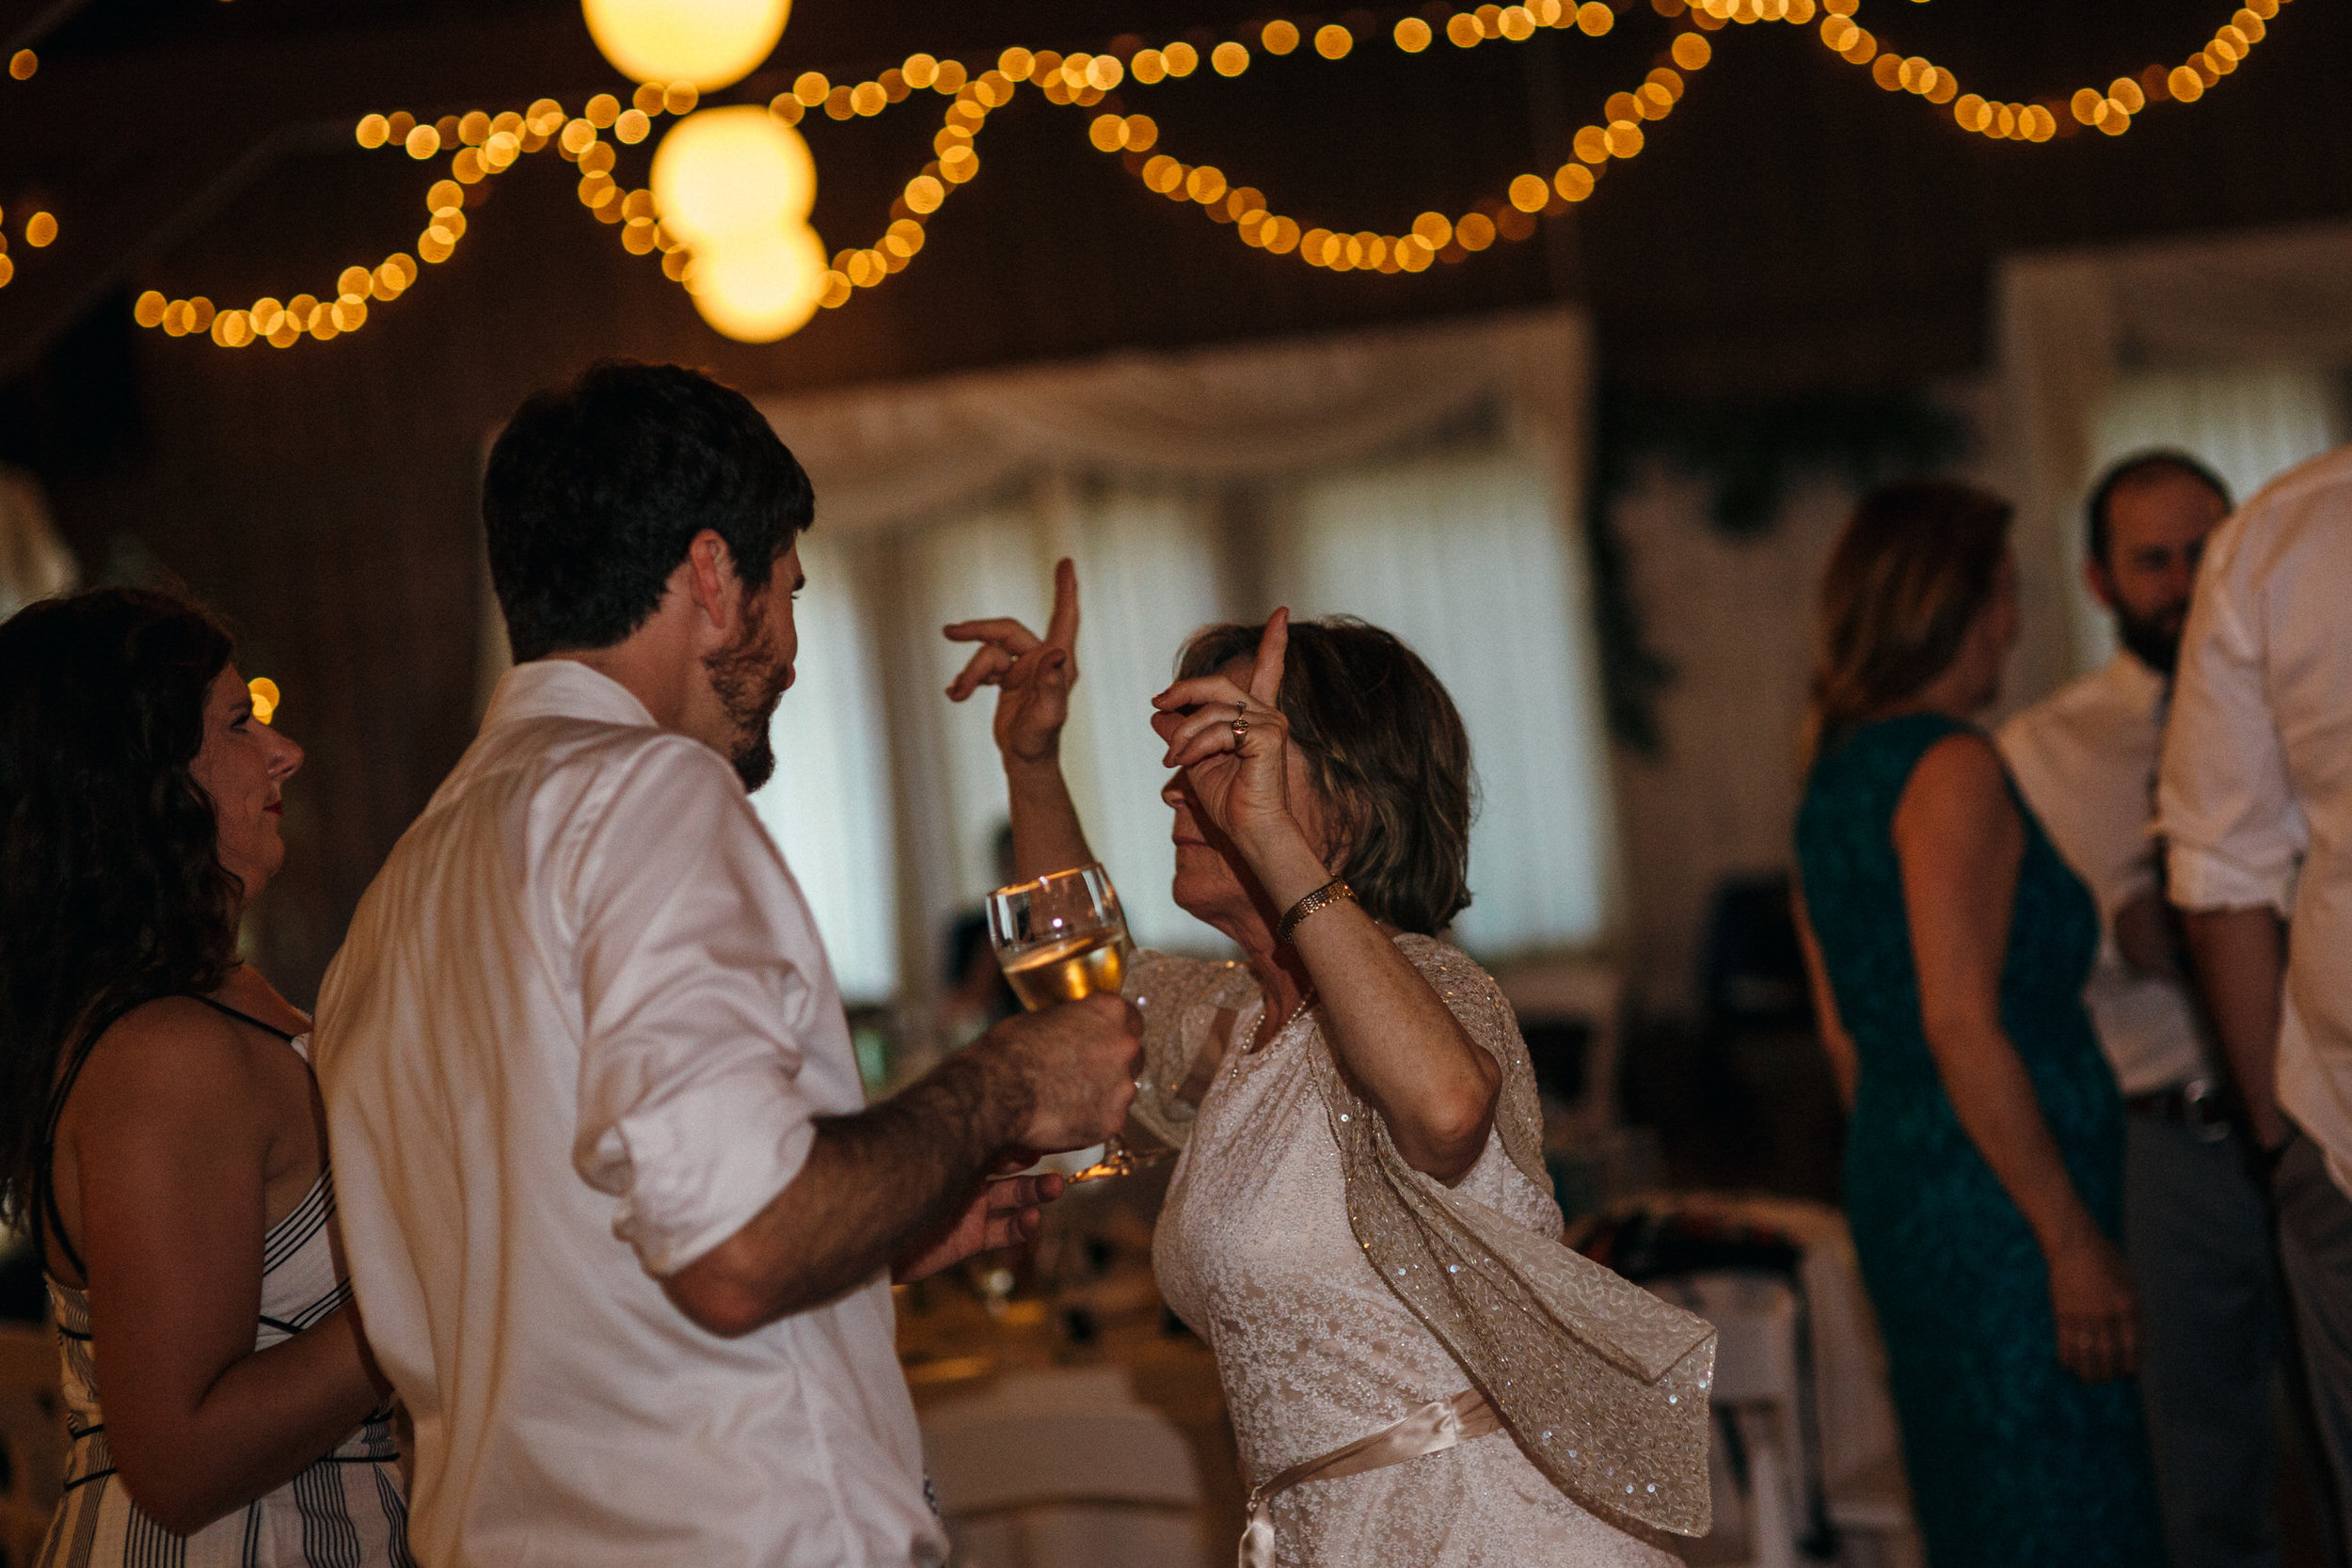 Laurelhurst Park club wedding photographer Portand pdx Oregon115.JPG